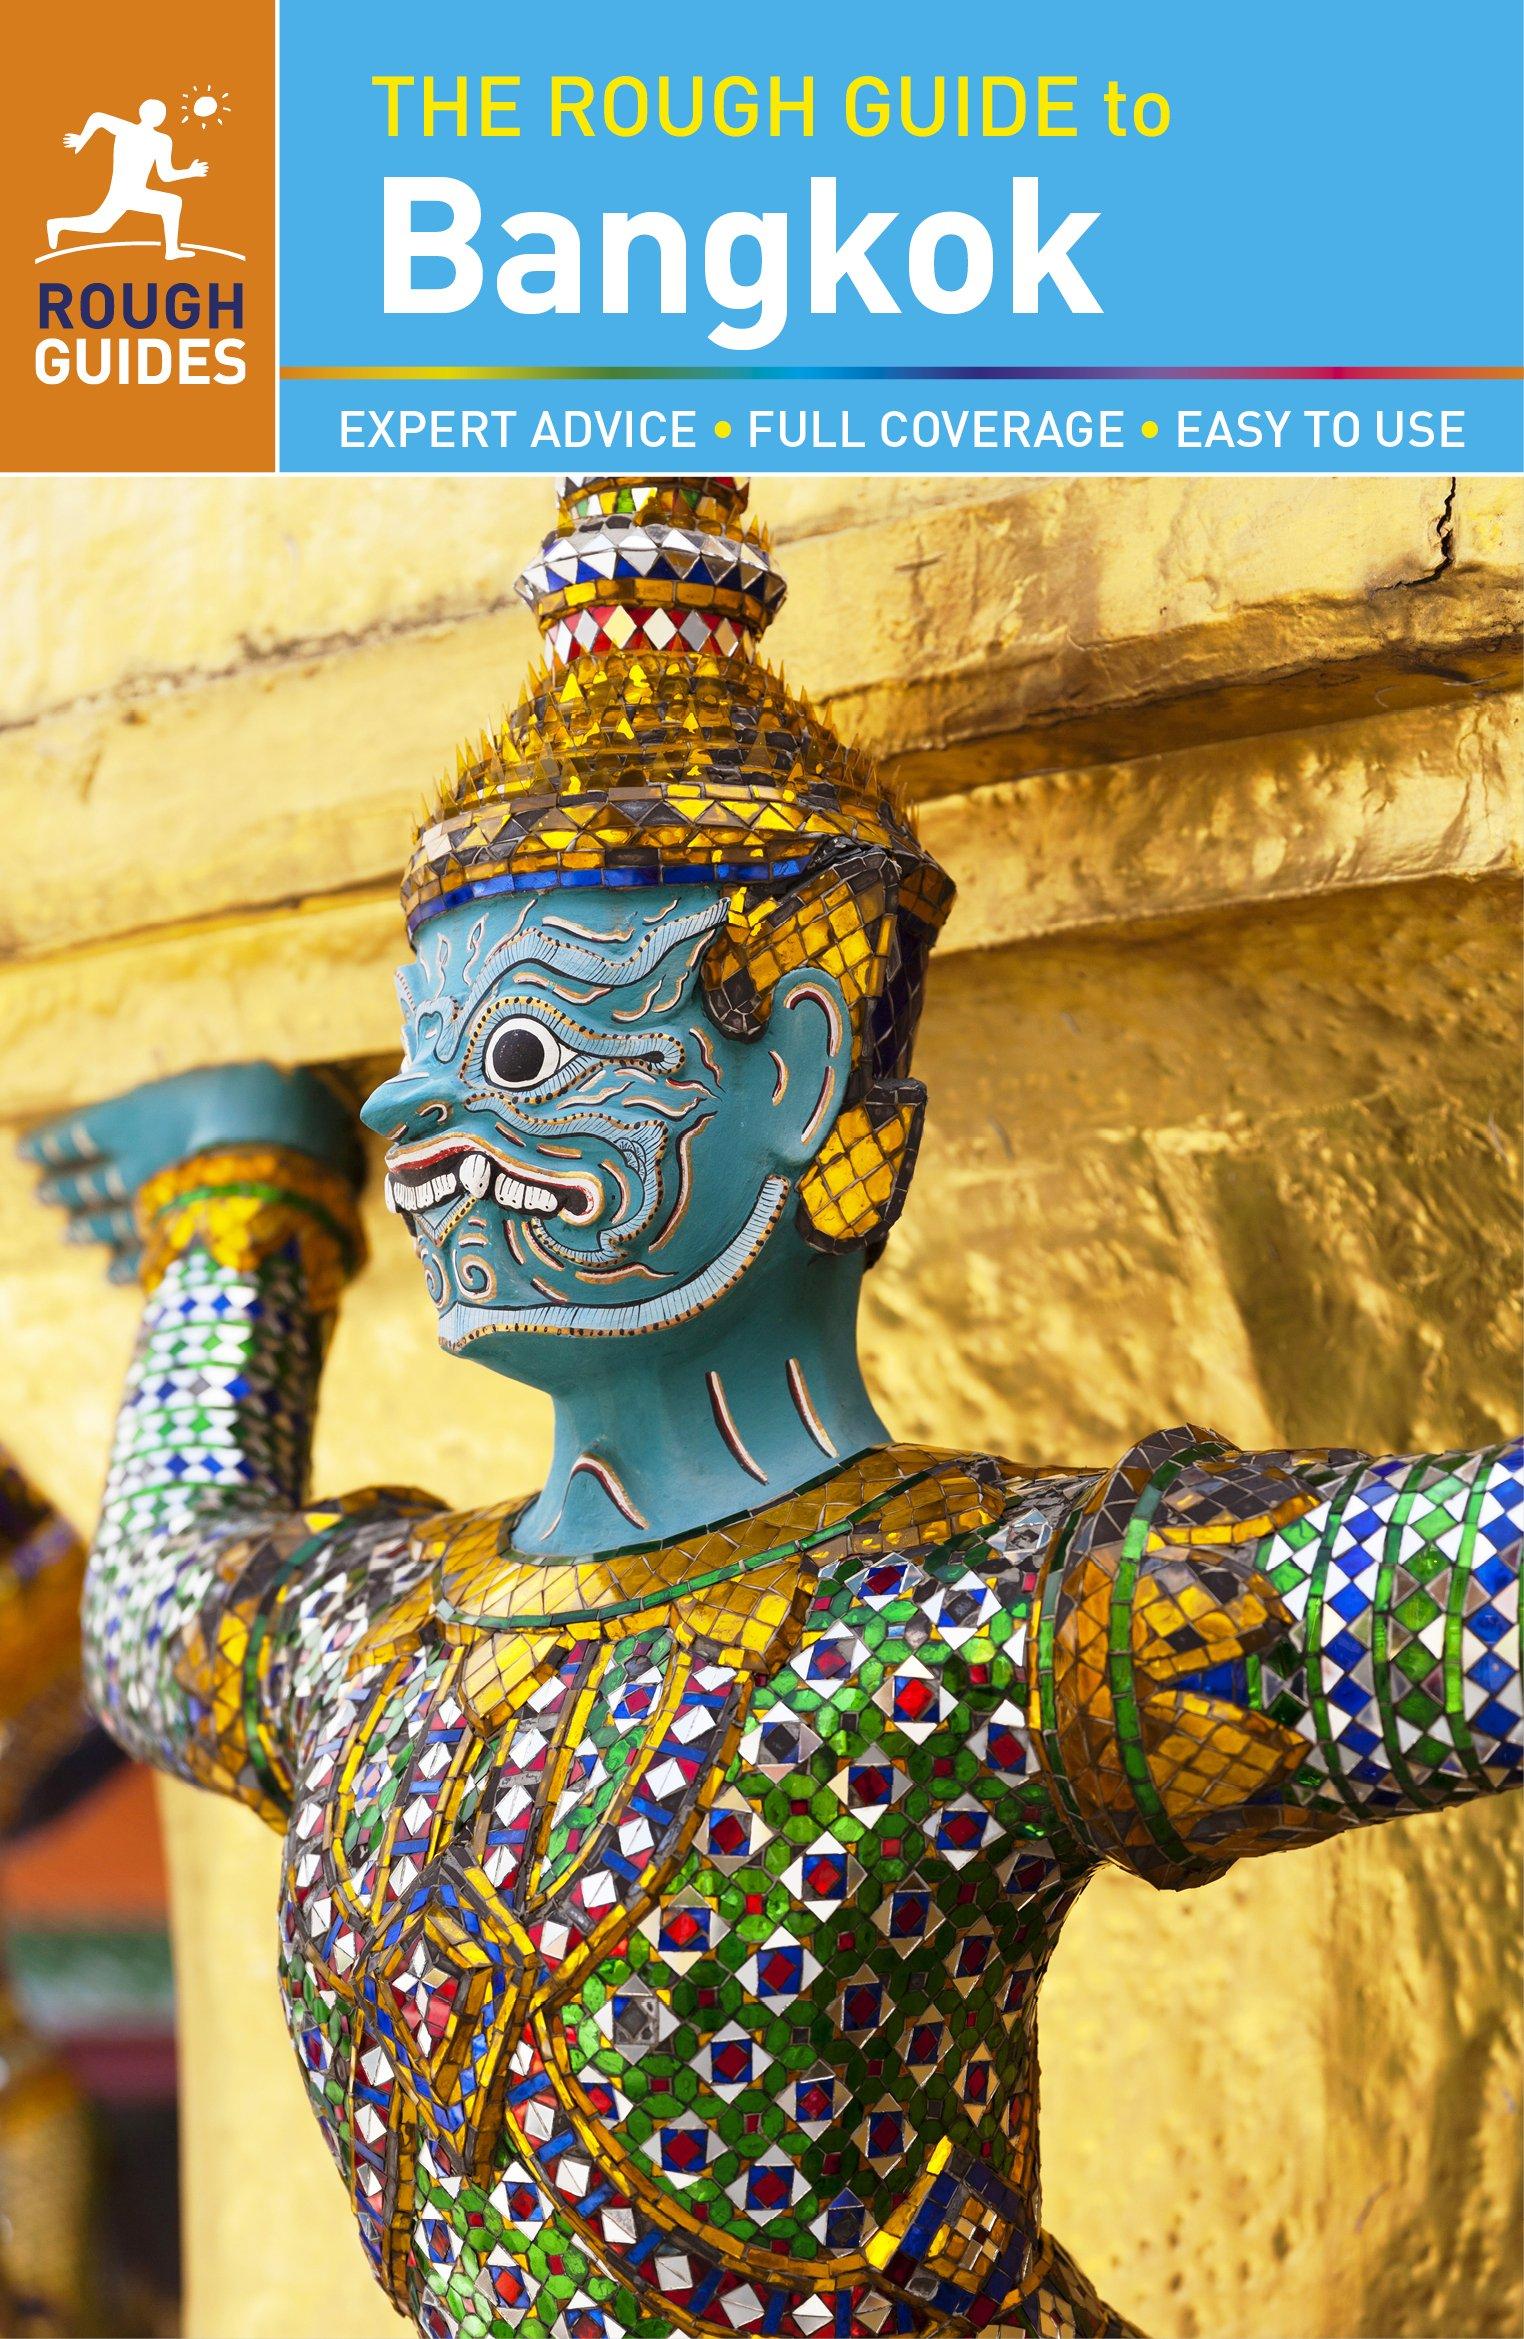 The Rough Guide to Bangkok (Rough Guides) ebook